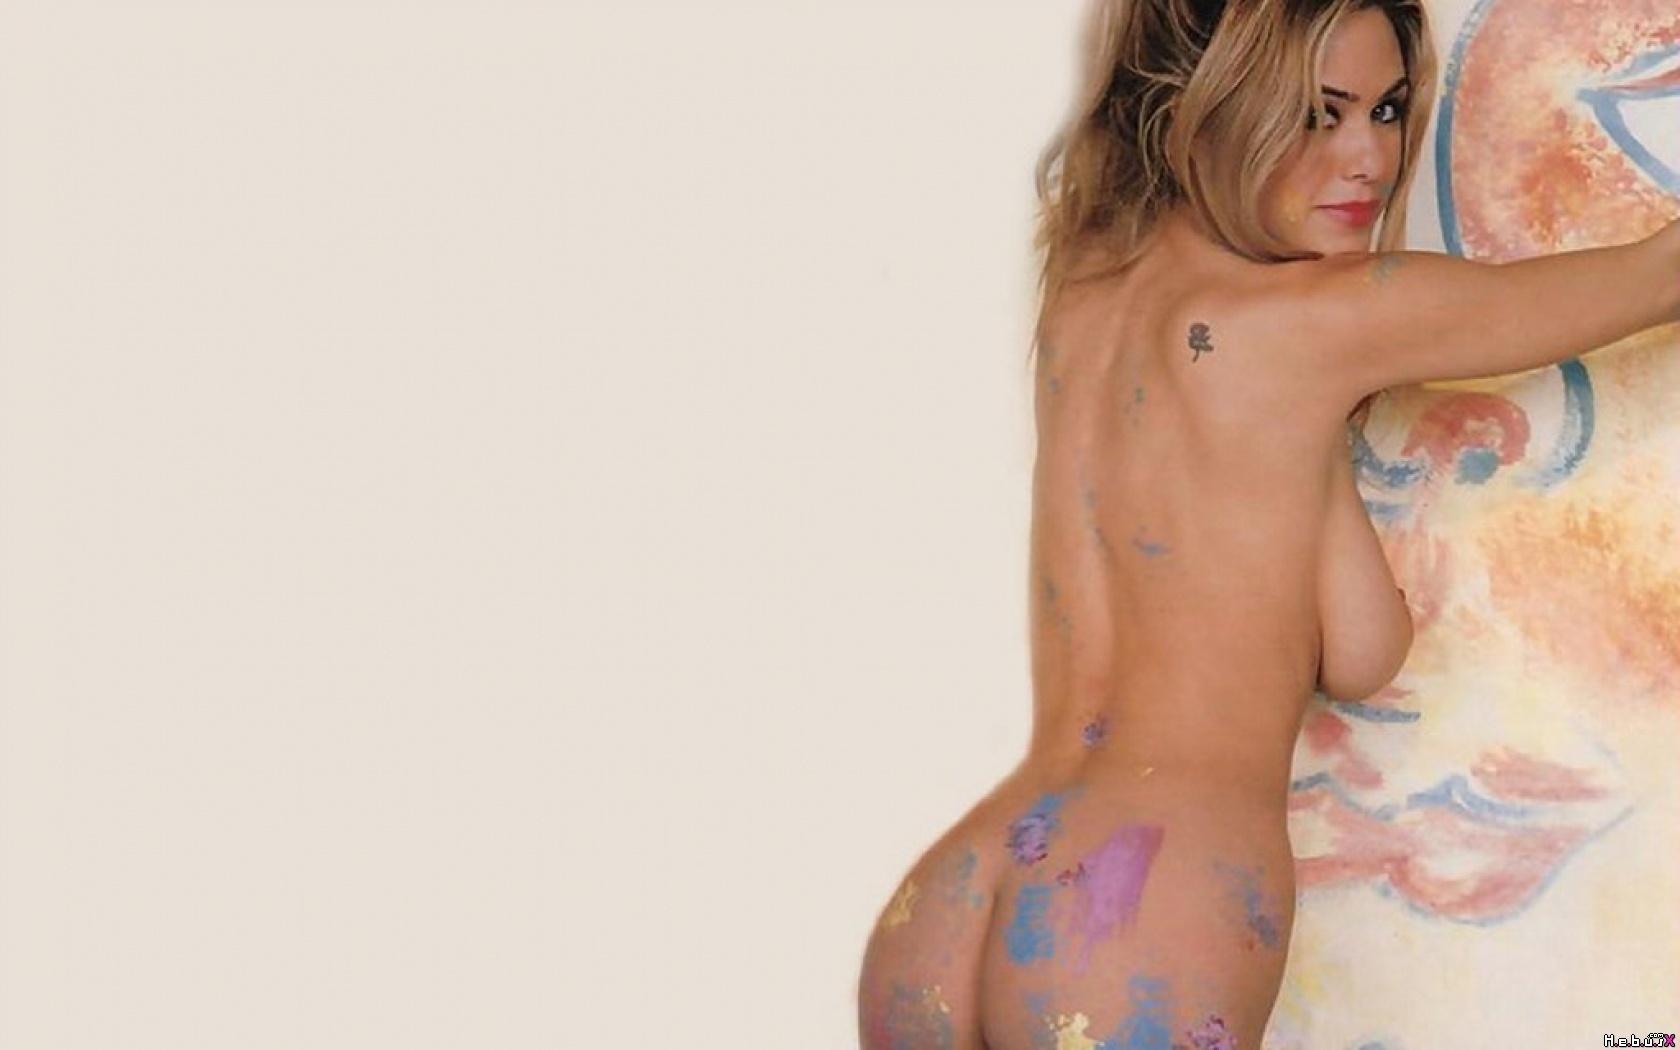 Erotica Shauna Sand nudes (25 photo), Sexy, Cleavage, Instagram, cameltoe 2020